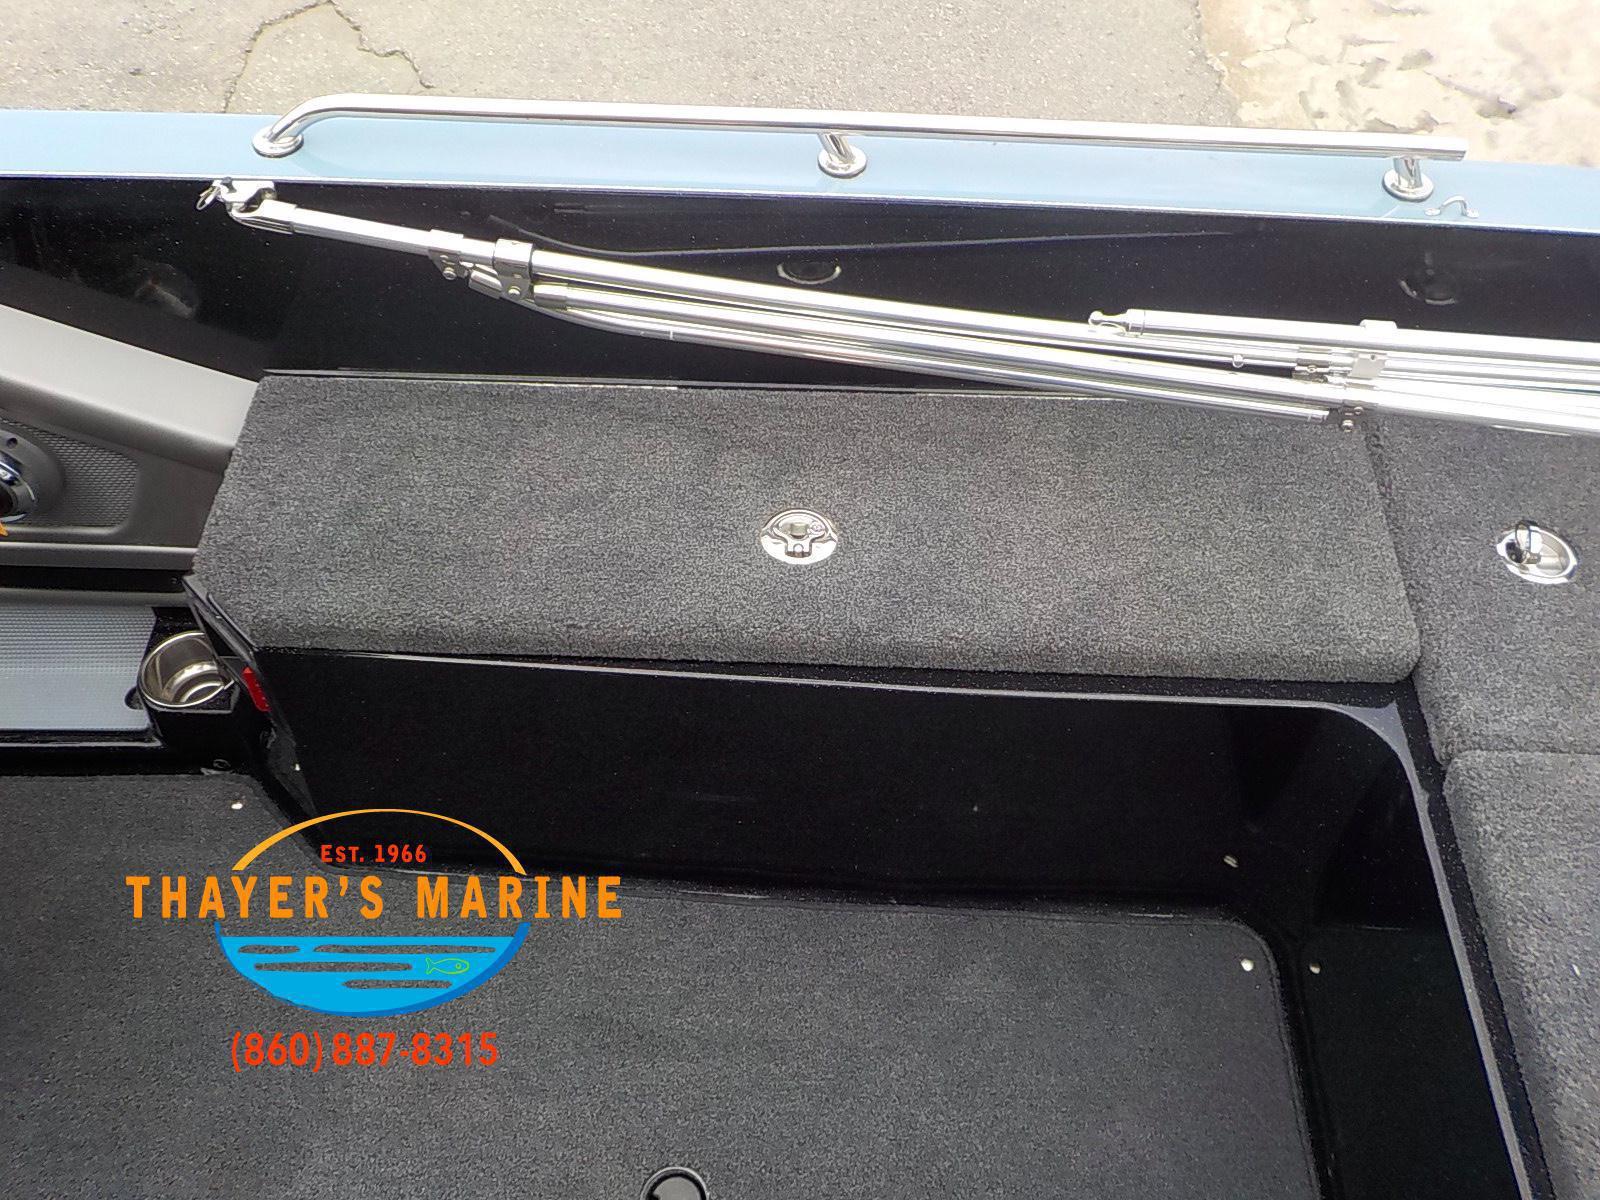 2019 Ranger 620FS for sale in Norwich, CT  Thayer's Marine